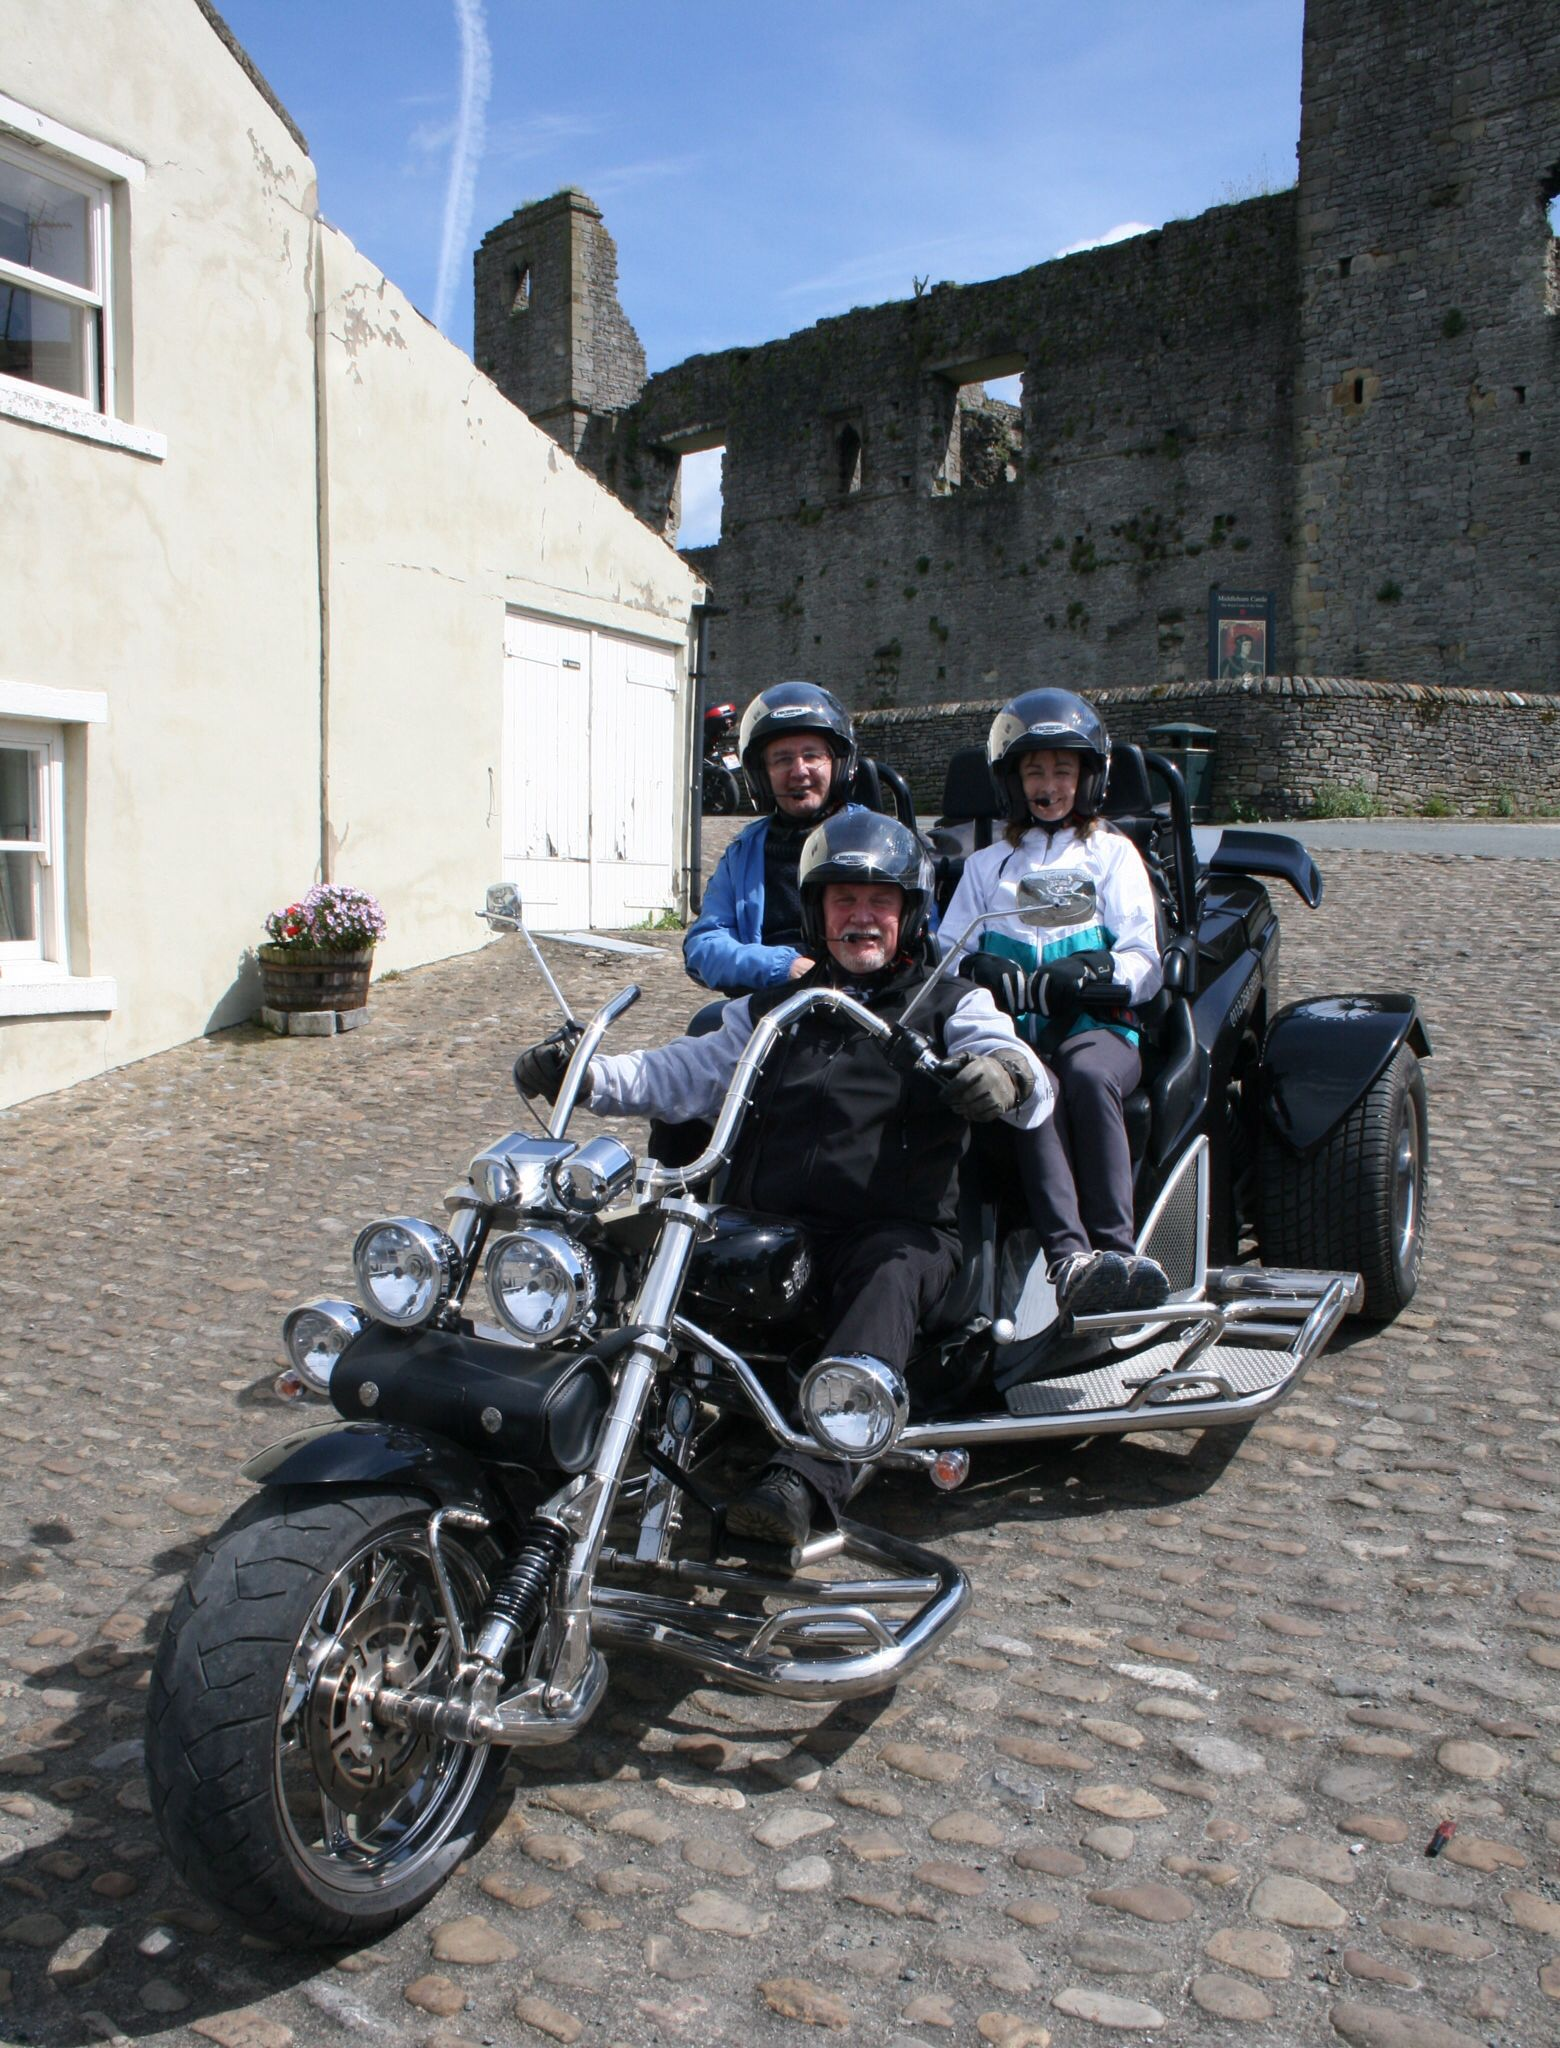 Enjoying, really enjoying, really really enjoying my day job. Yorkshire Trike Tours Chauffeur Tour Guide. www.yorkshiretriketours.co.uk